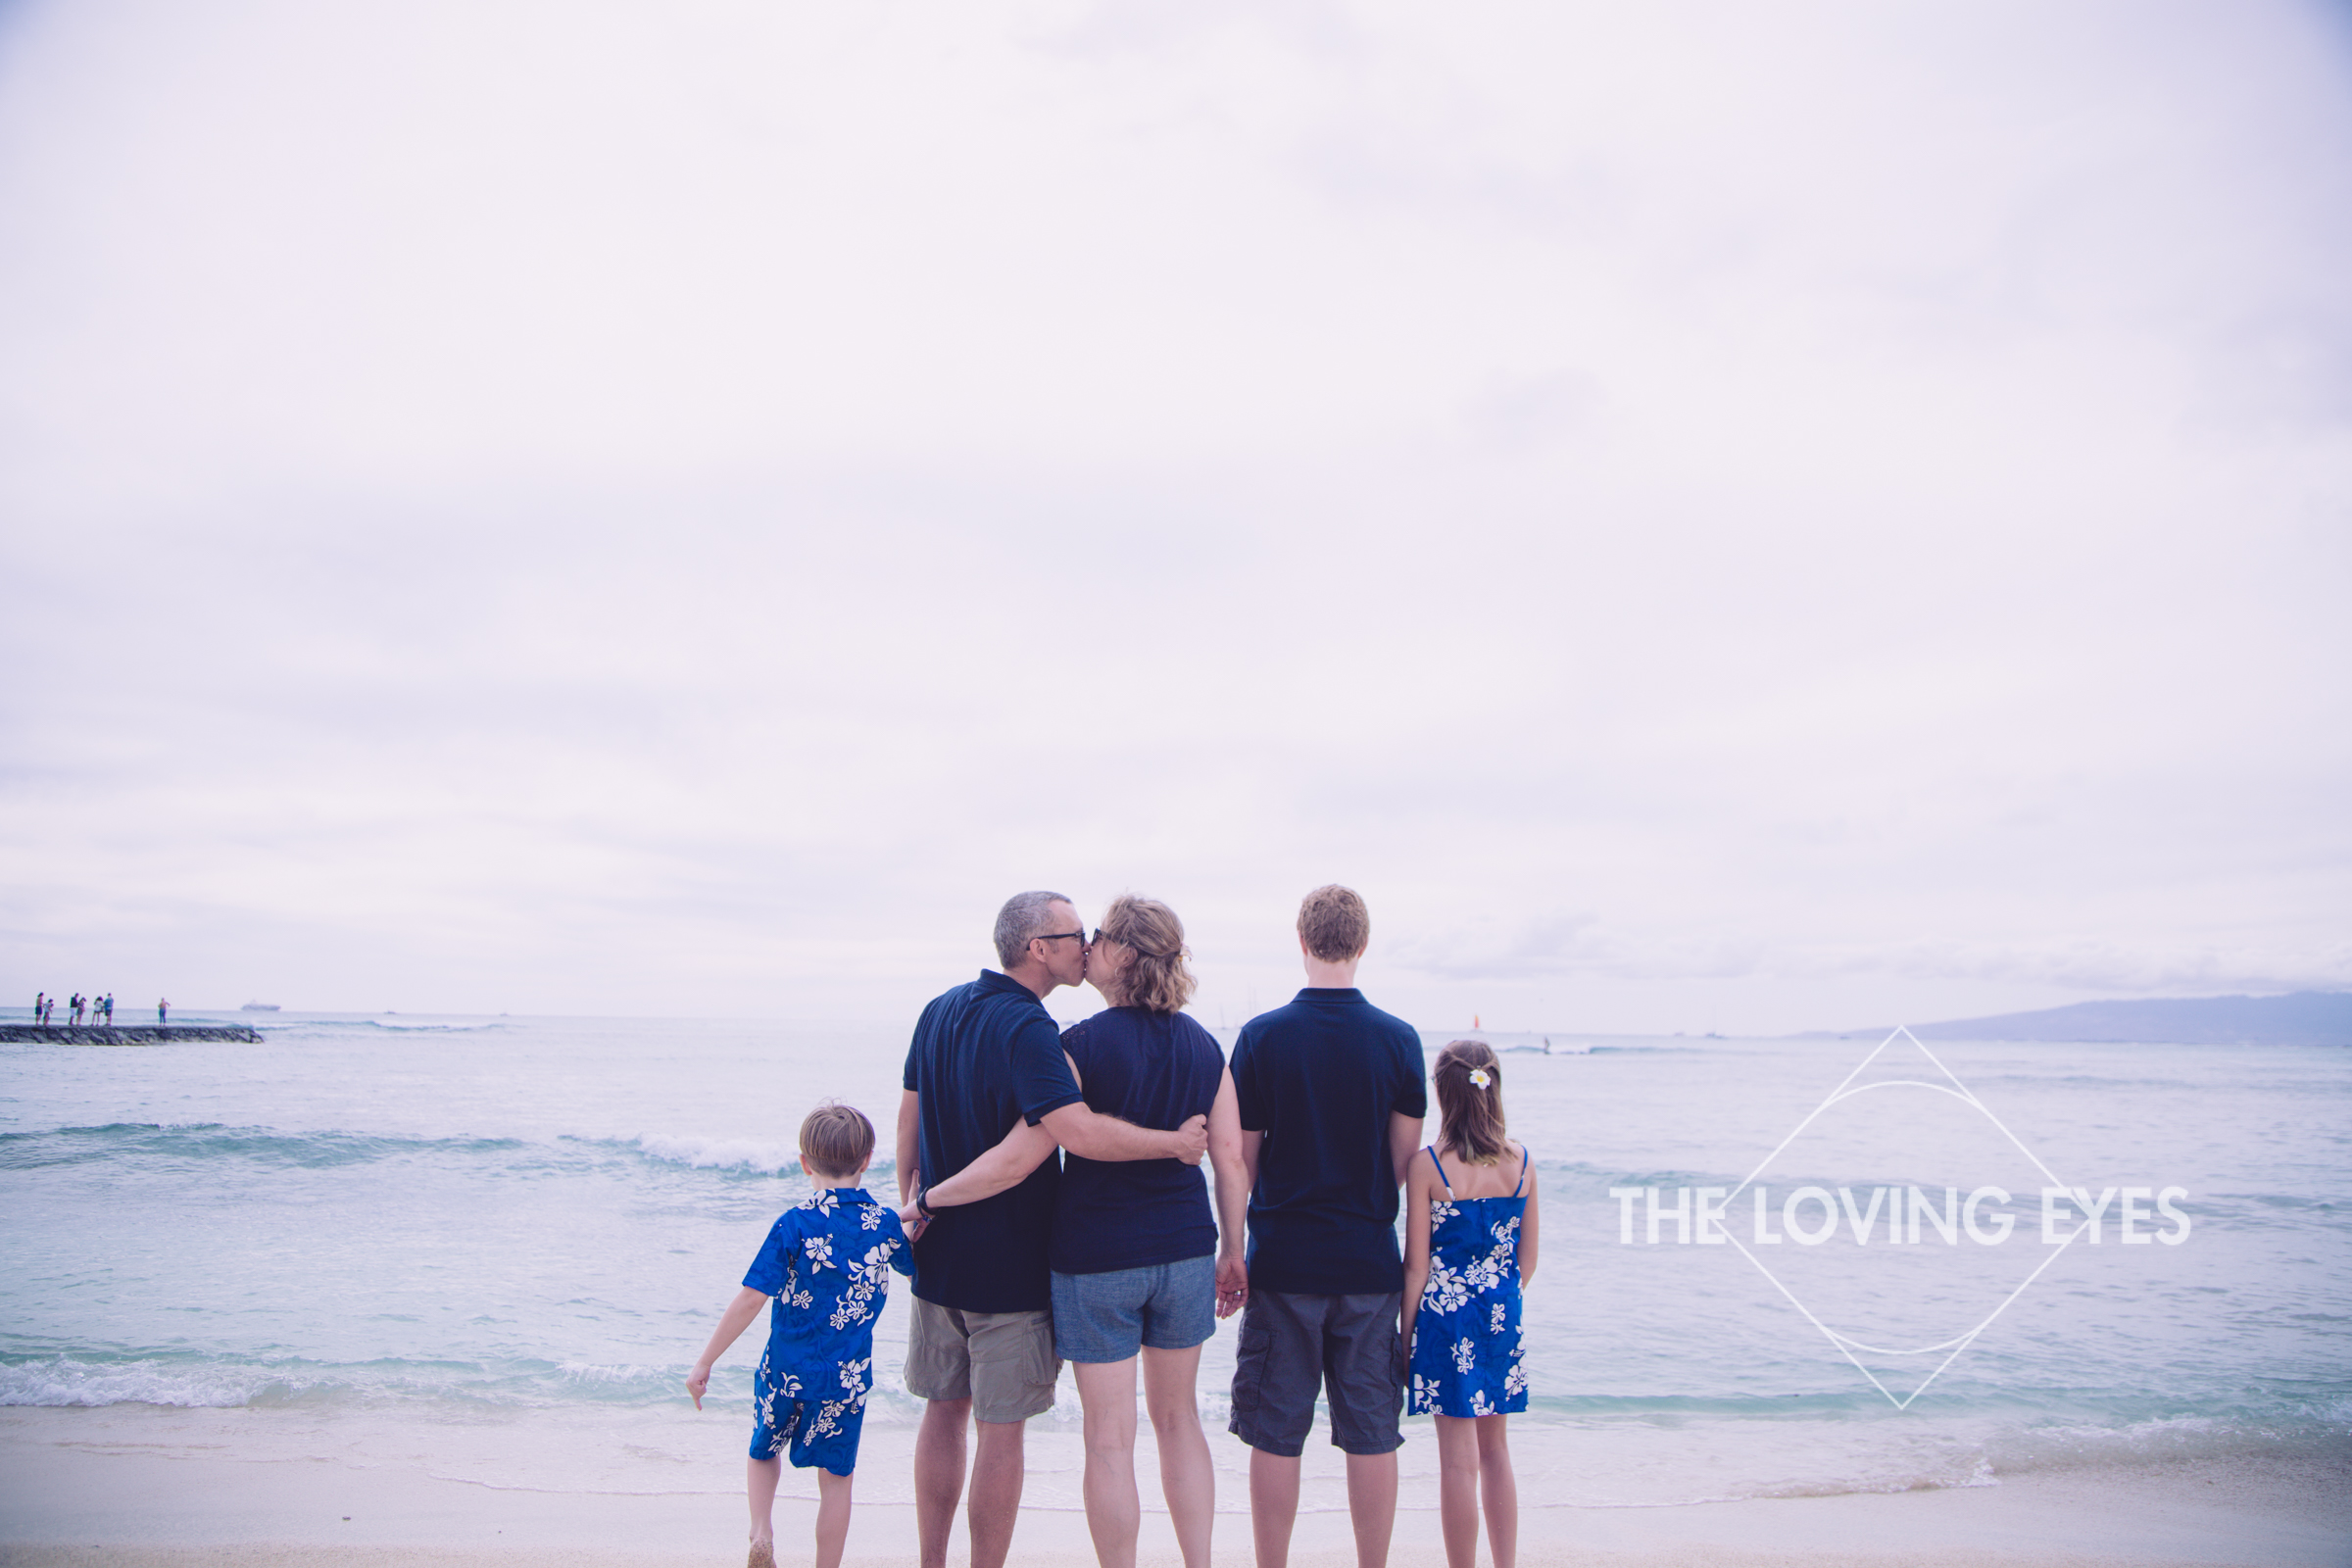 Family vacation photo on the beach in Waikiki Hawaii